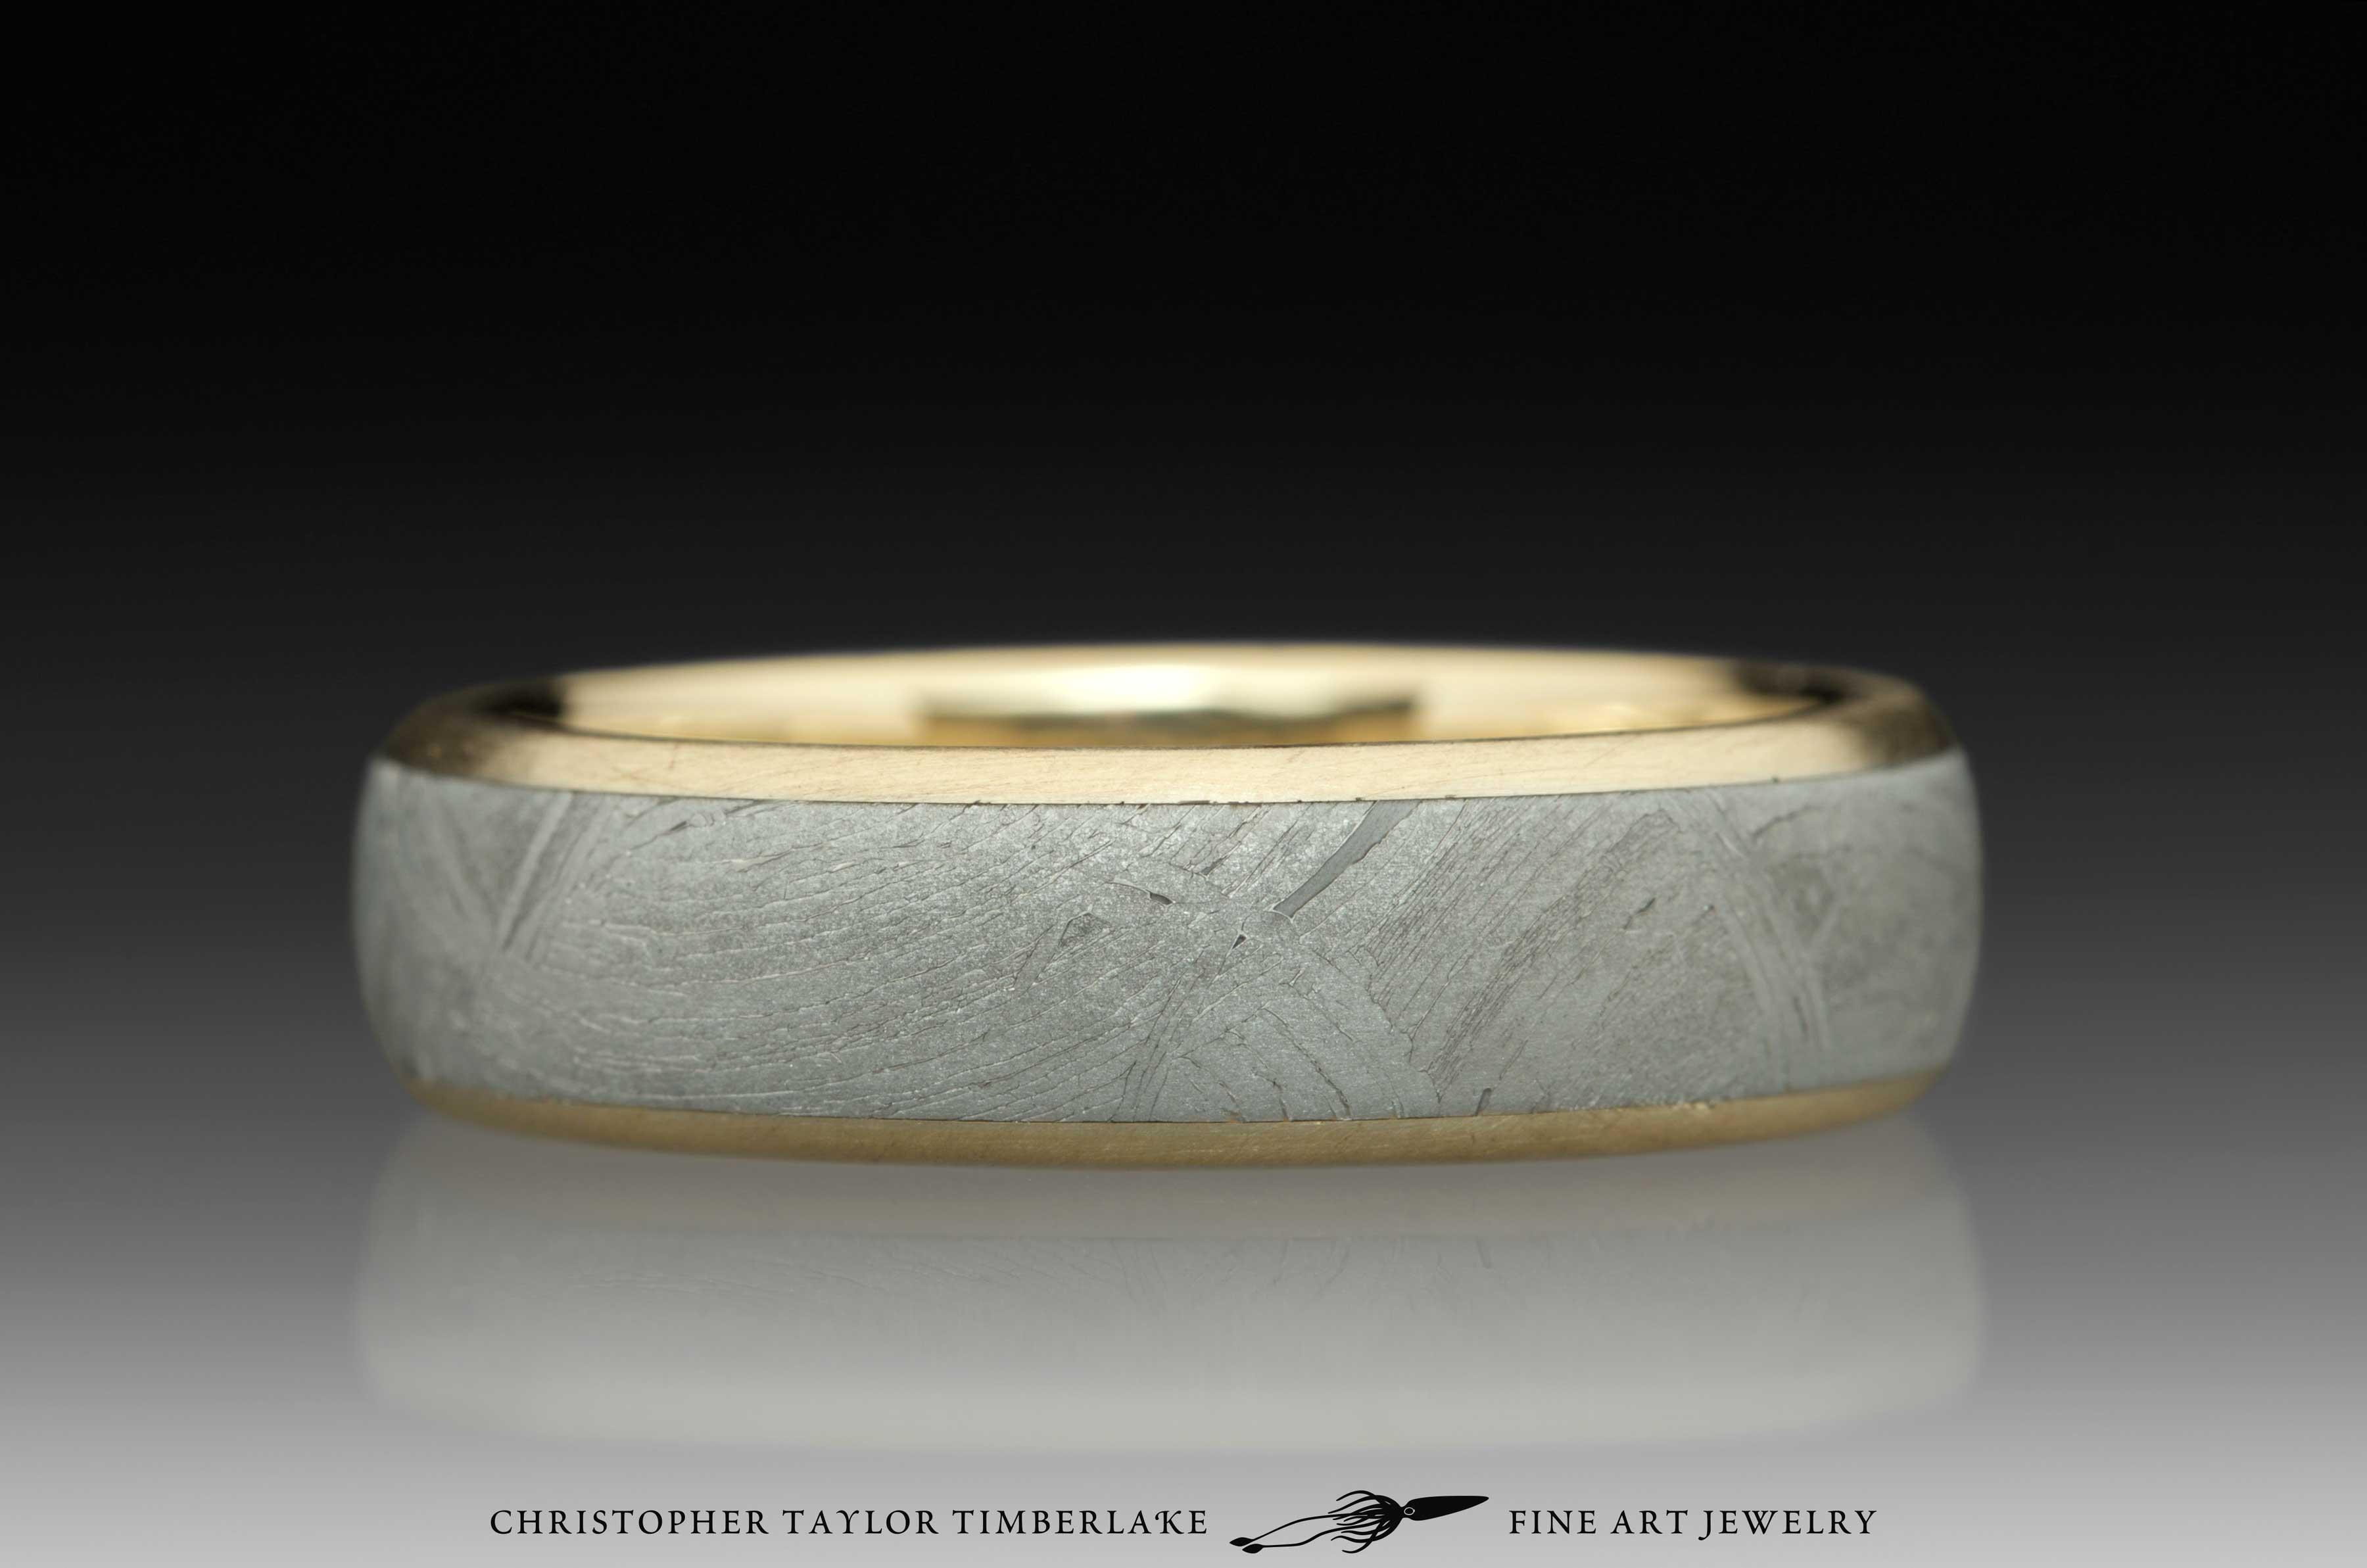 Meteorite-14K-karat-yellow-gold-ring,-domed,-etched,-(.75-4.5-.75)-6mm,-14K-yellow-gold-rims-1